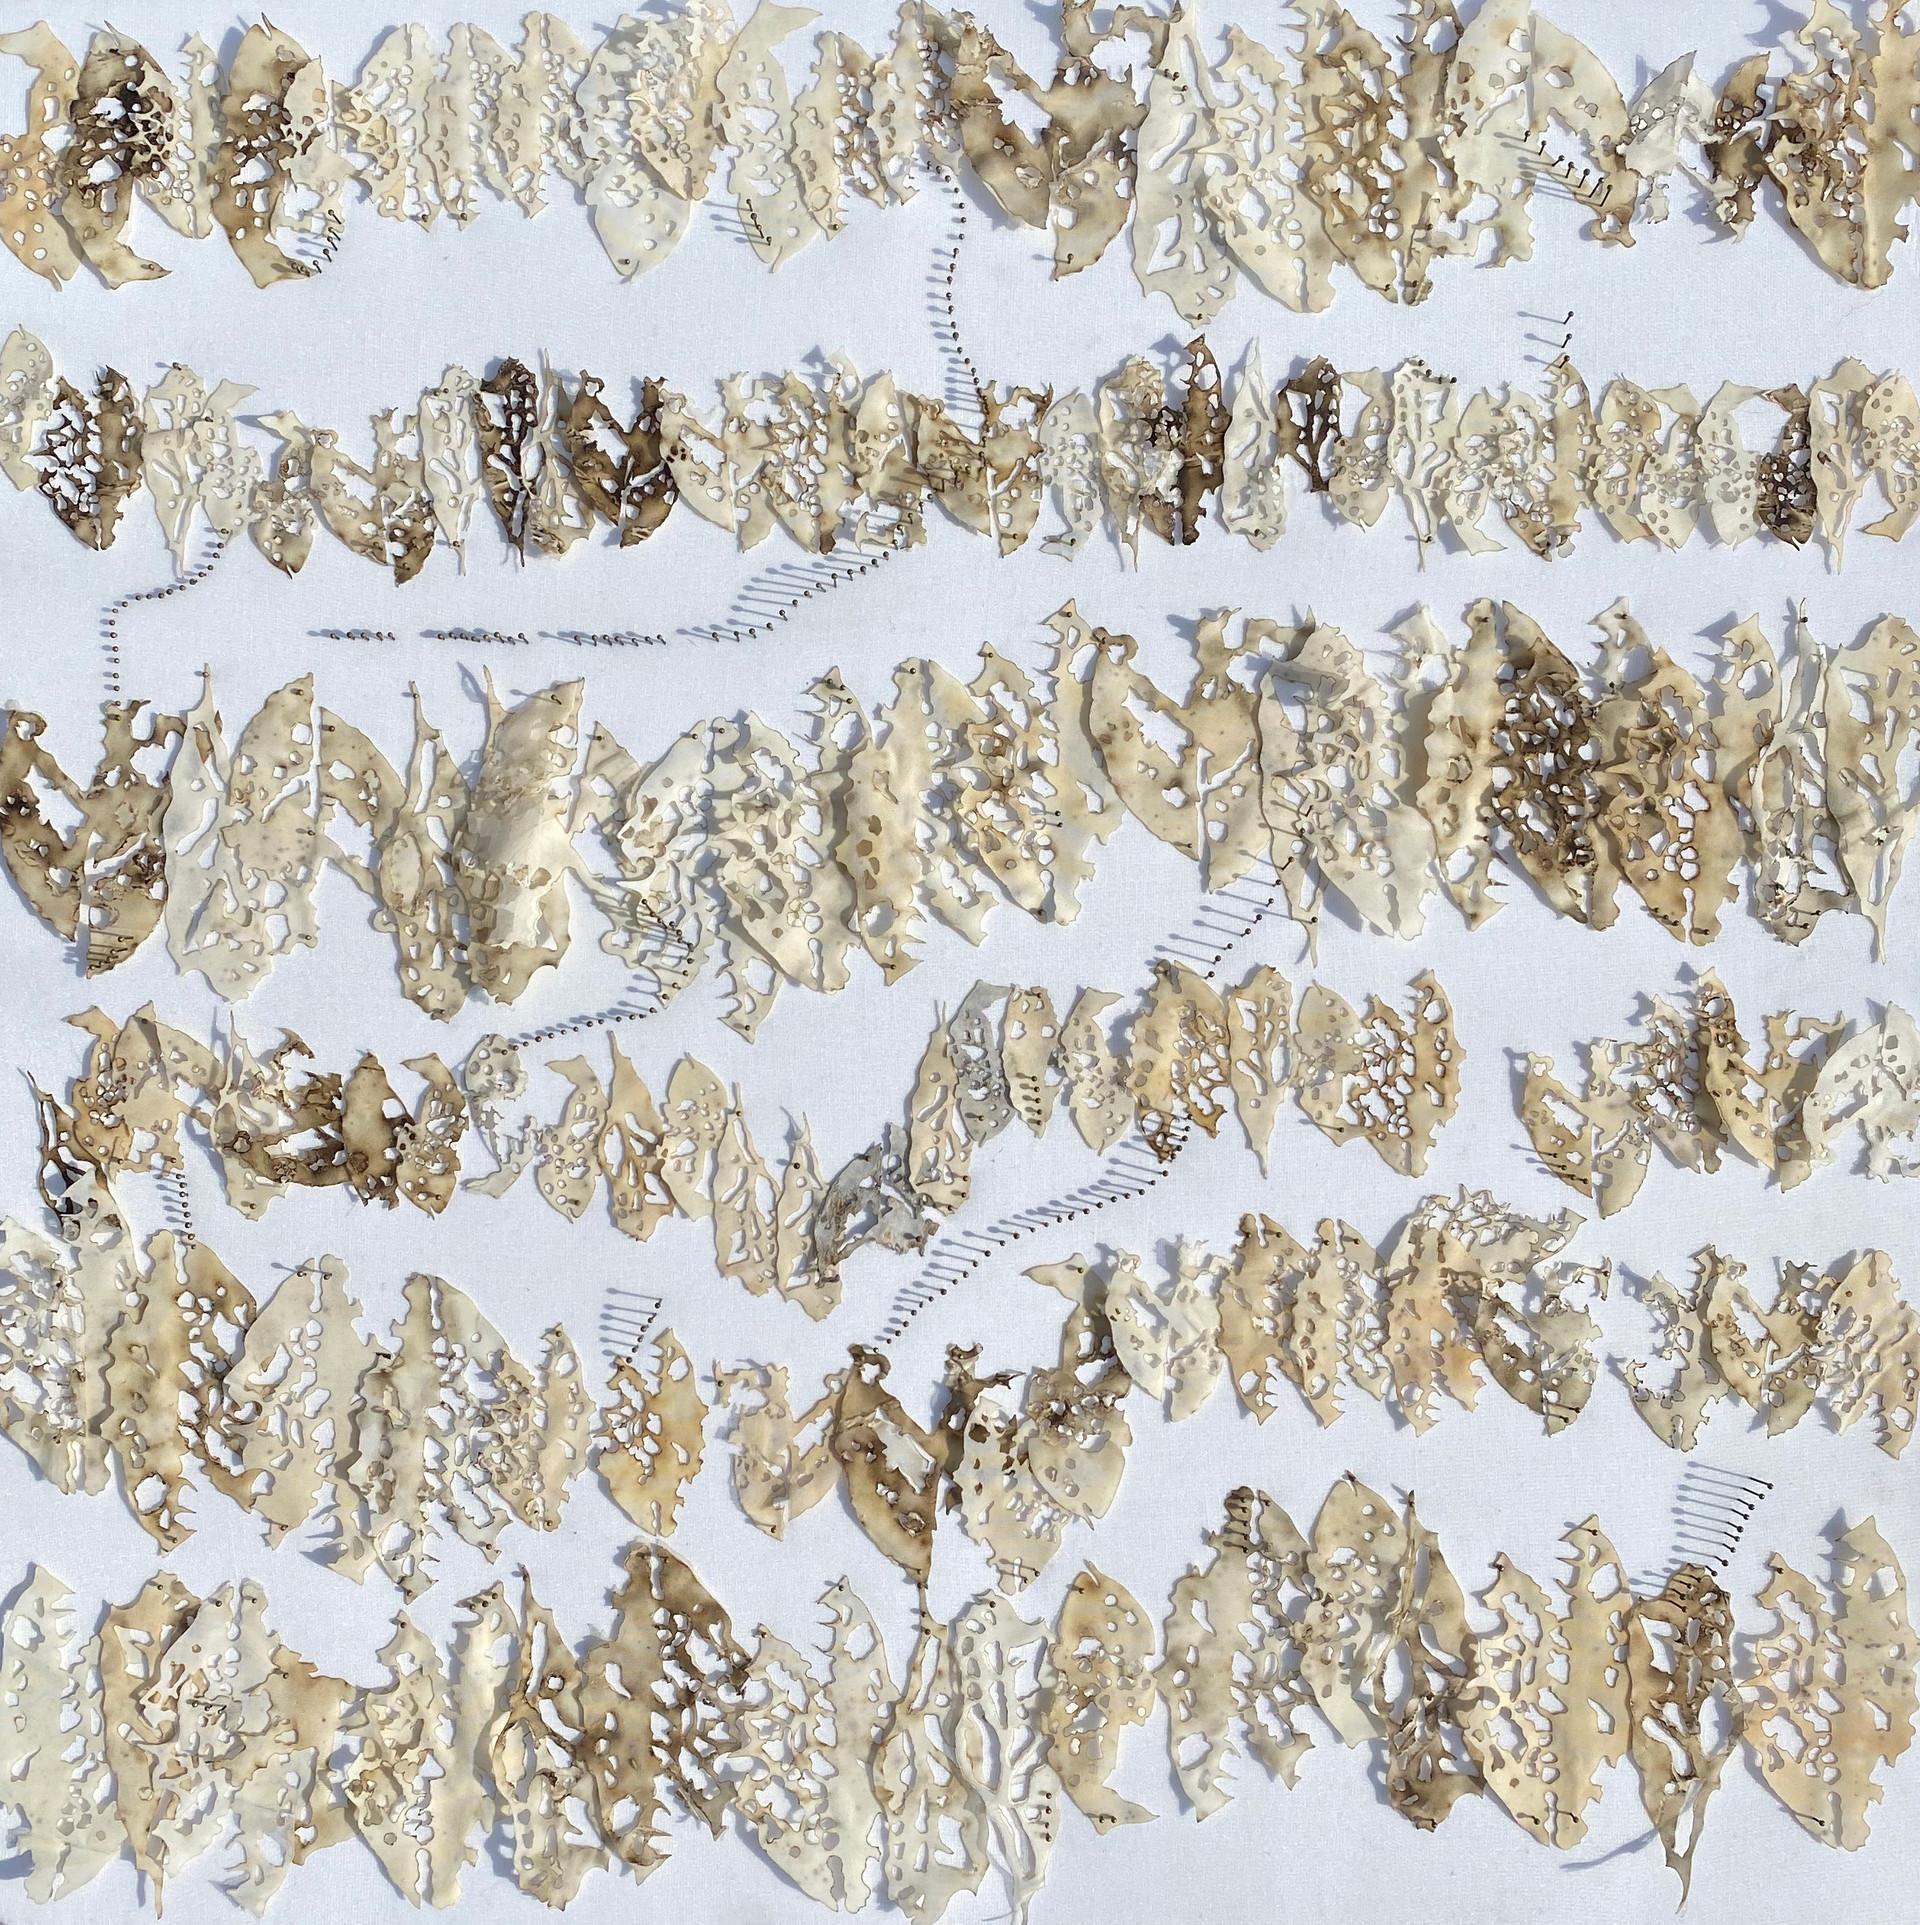 Bitten Leaves II/2020/Mixed techniques & entomological pins on linen/60x60 cm